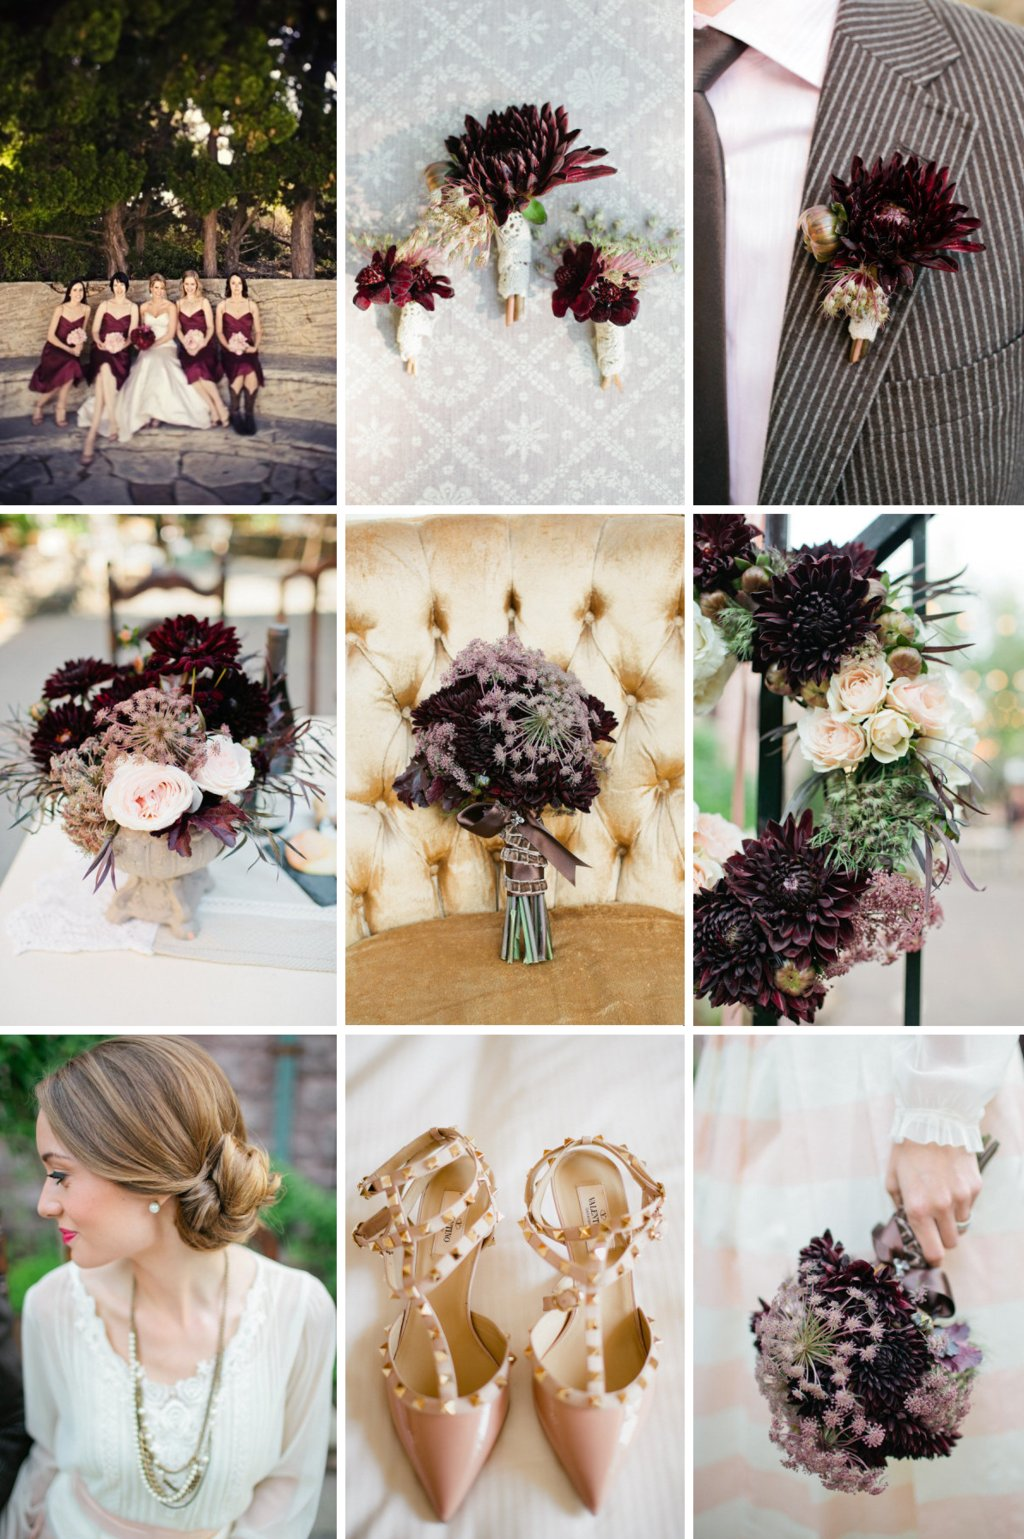 Autumn-elegance-wedding-decor-flowers-inspiration-color-palettes.full